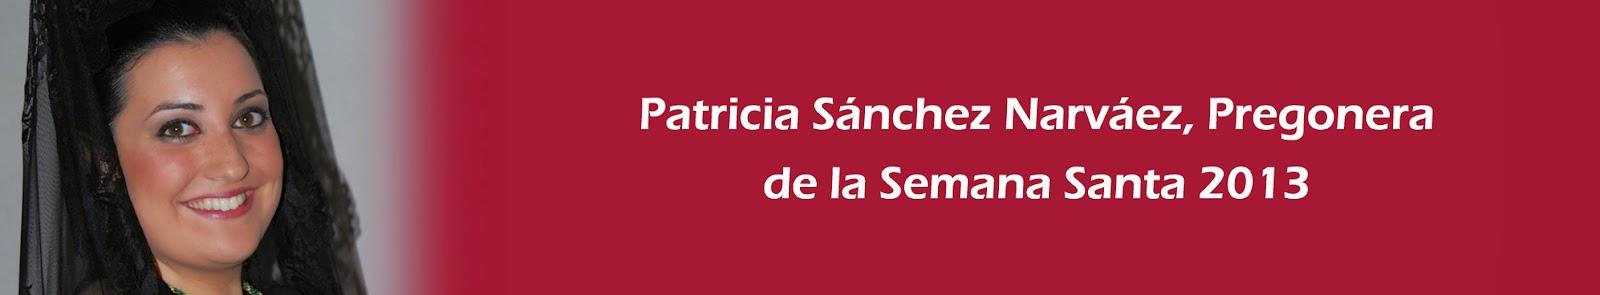 http://pasionygloriasdeconil.blogspot.com.es/2013/03/entrevista-dna-patricia-sanchez.html